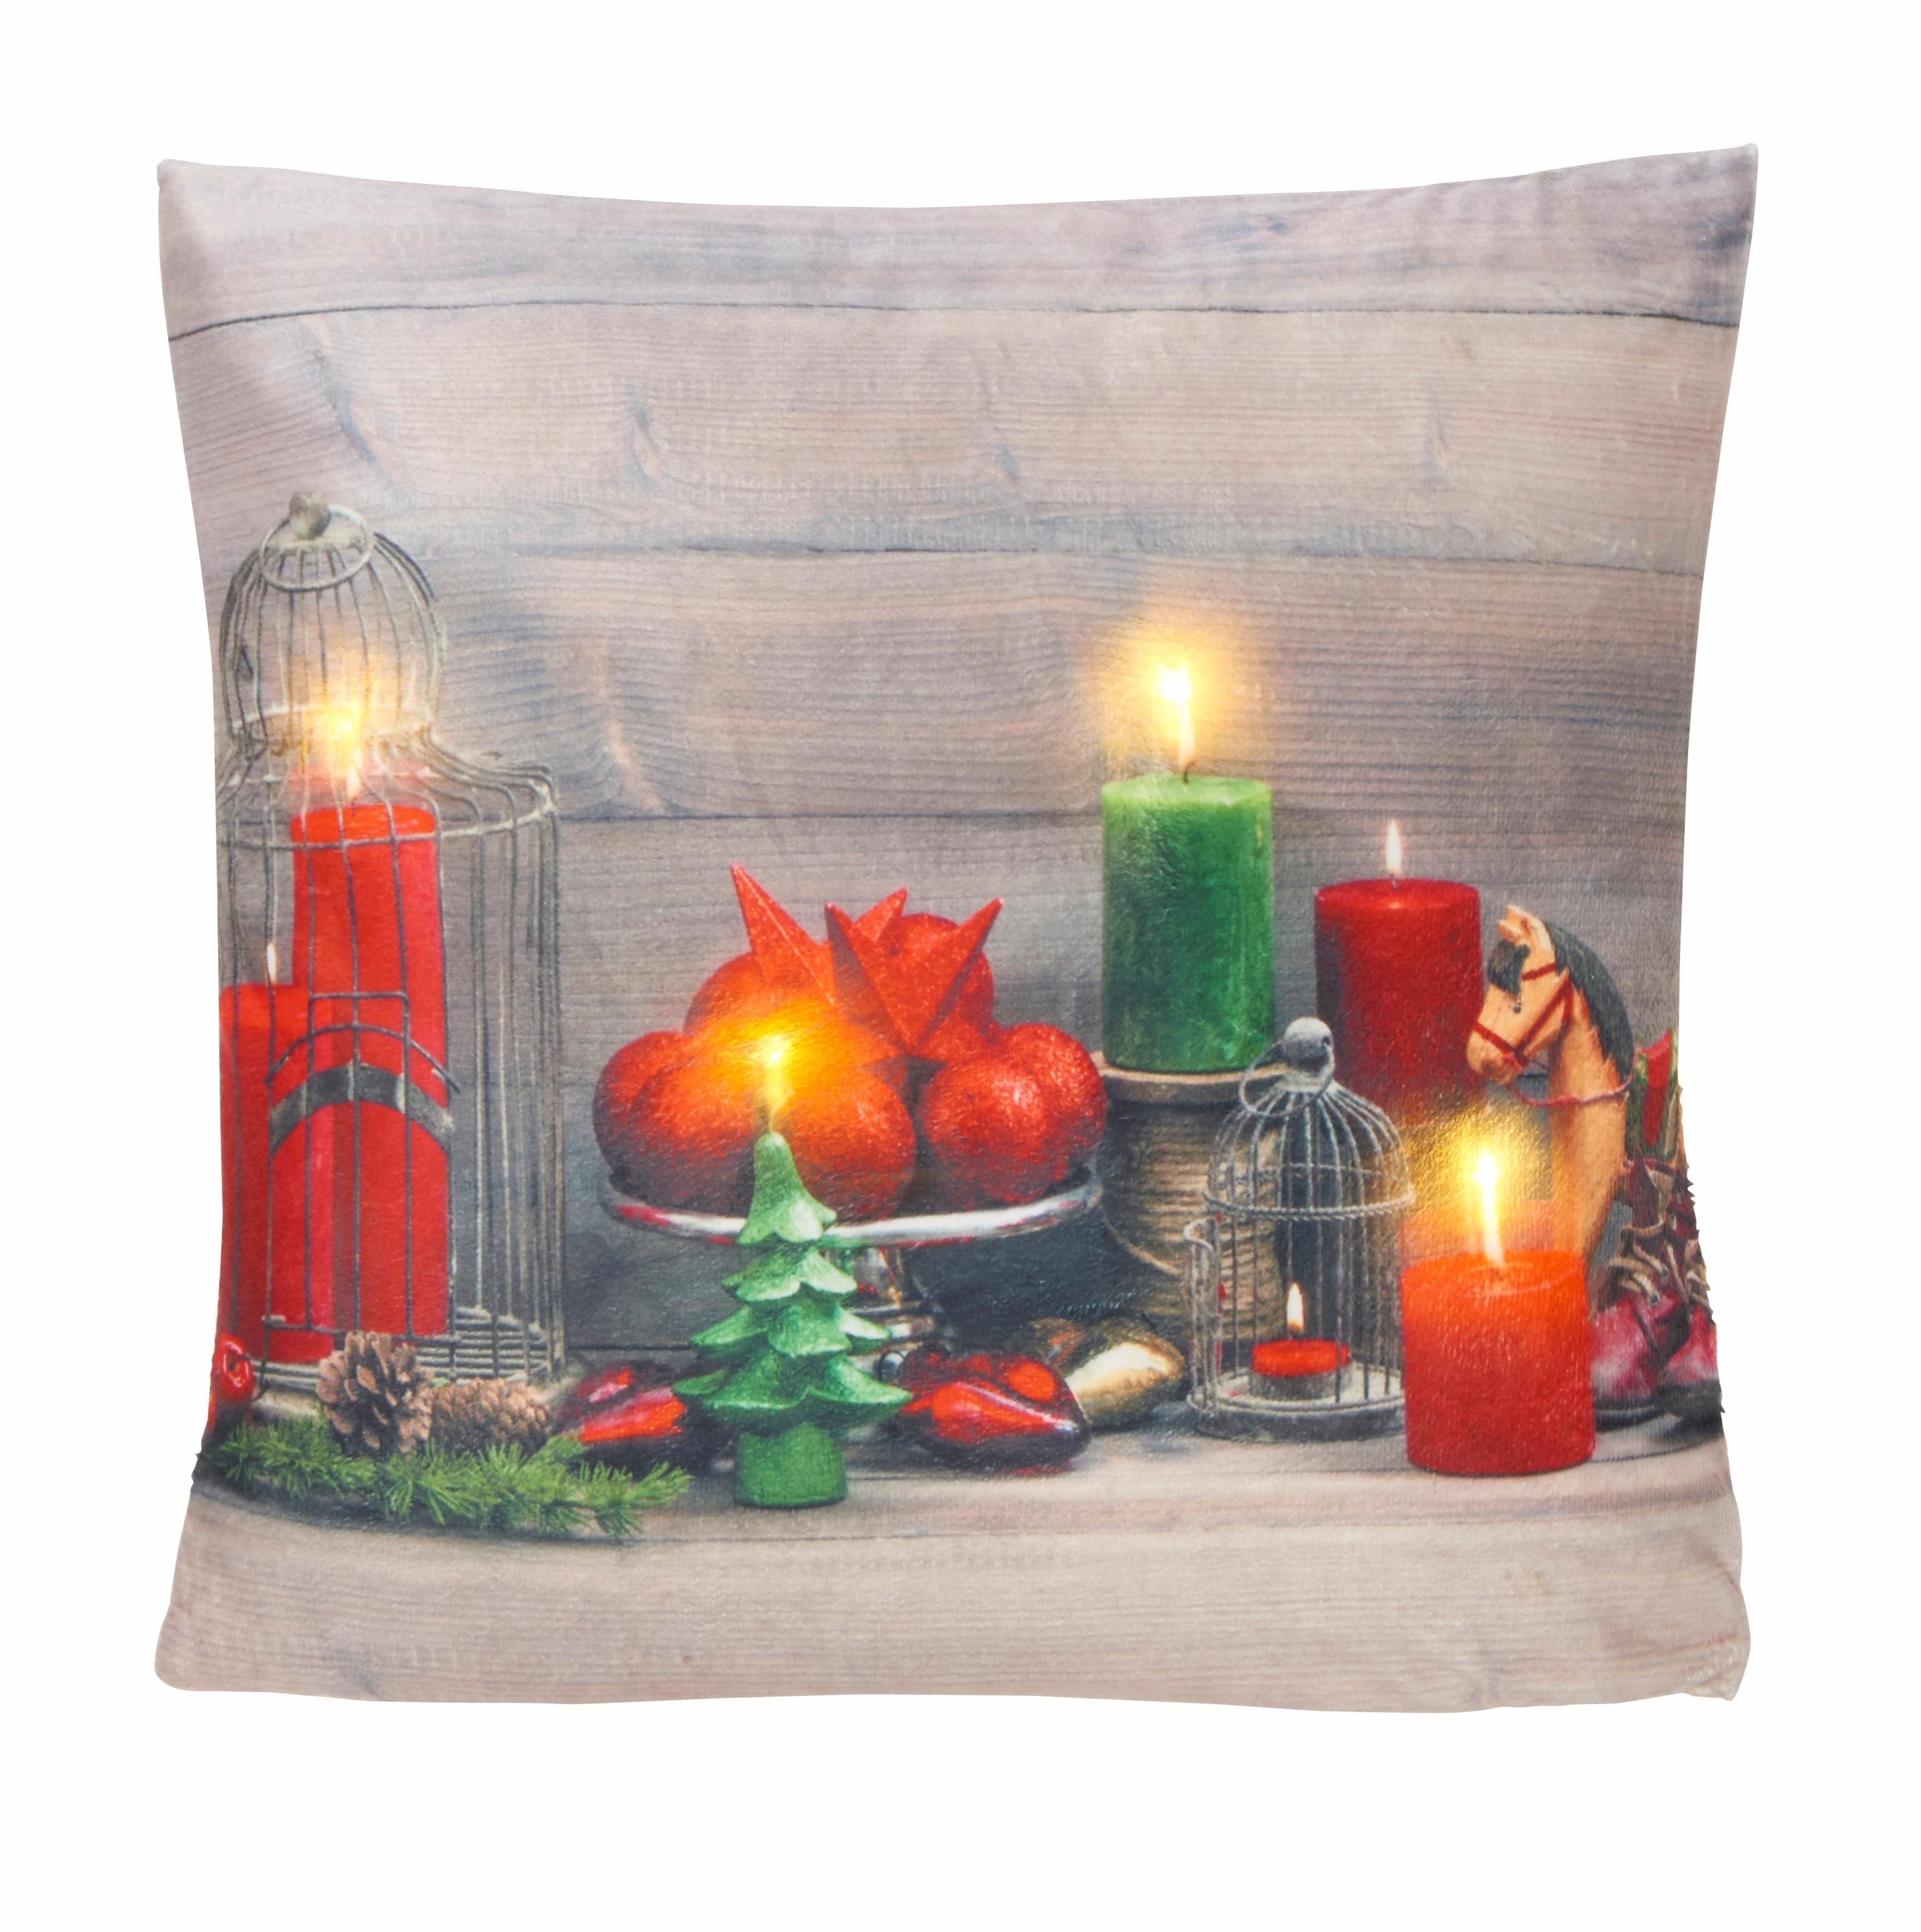 My Home Led-kussenovertrek, »Santa« (per stuk) nu online kopen bij OTTO